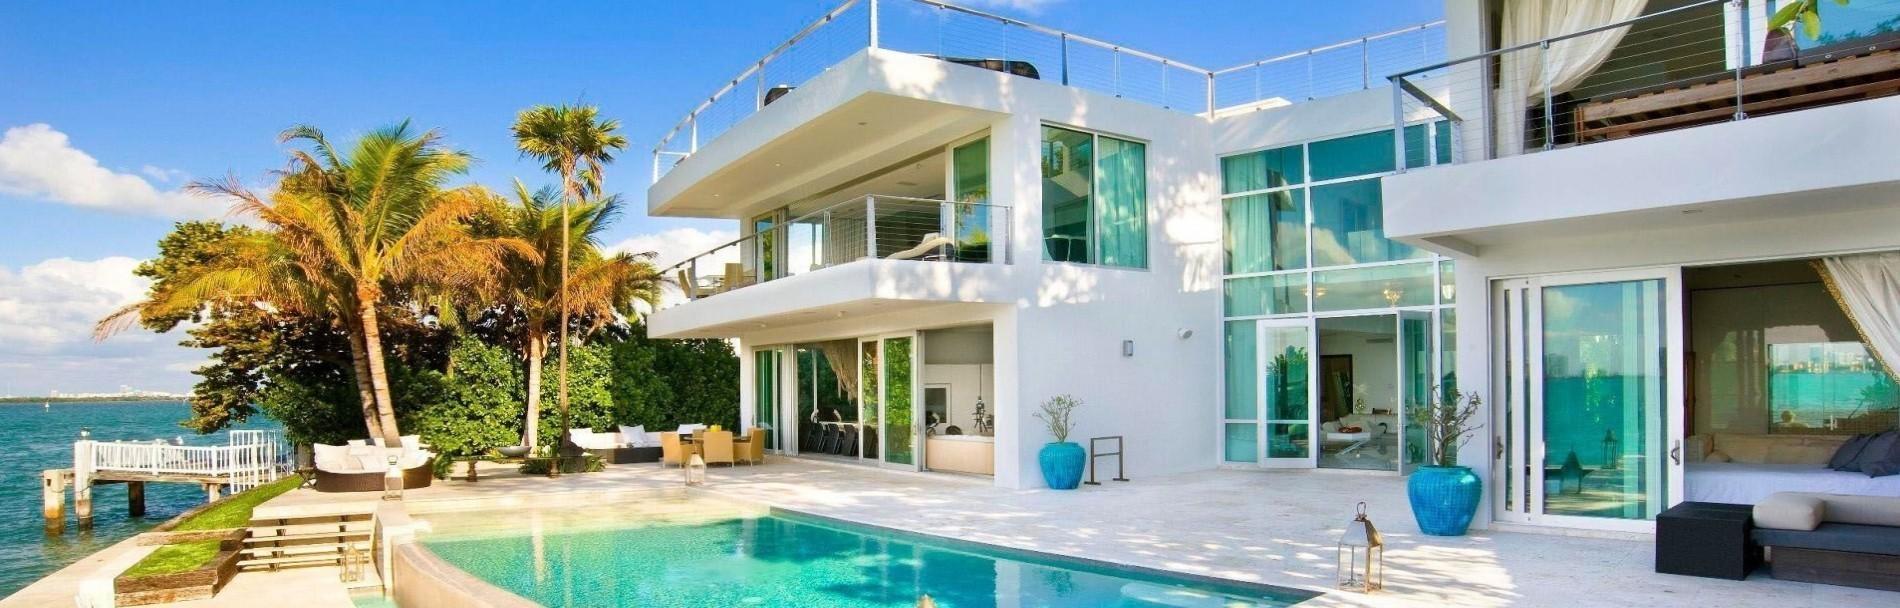 Bed and breakfast b b vacation rentals seasonal for Decoration villa de luxe